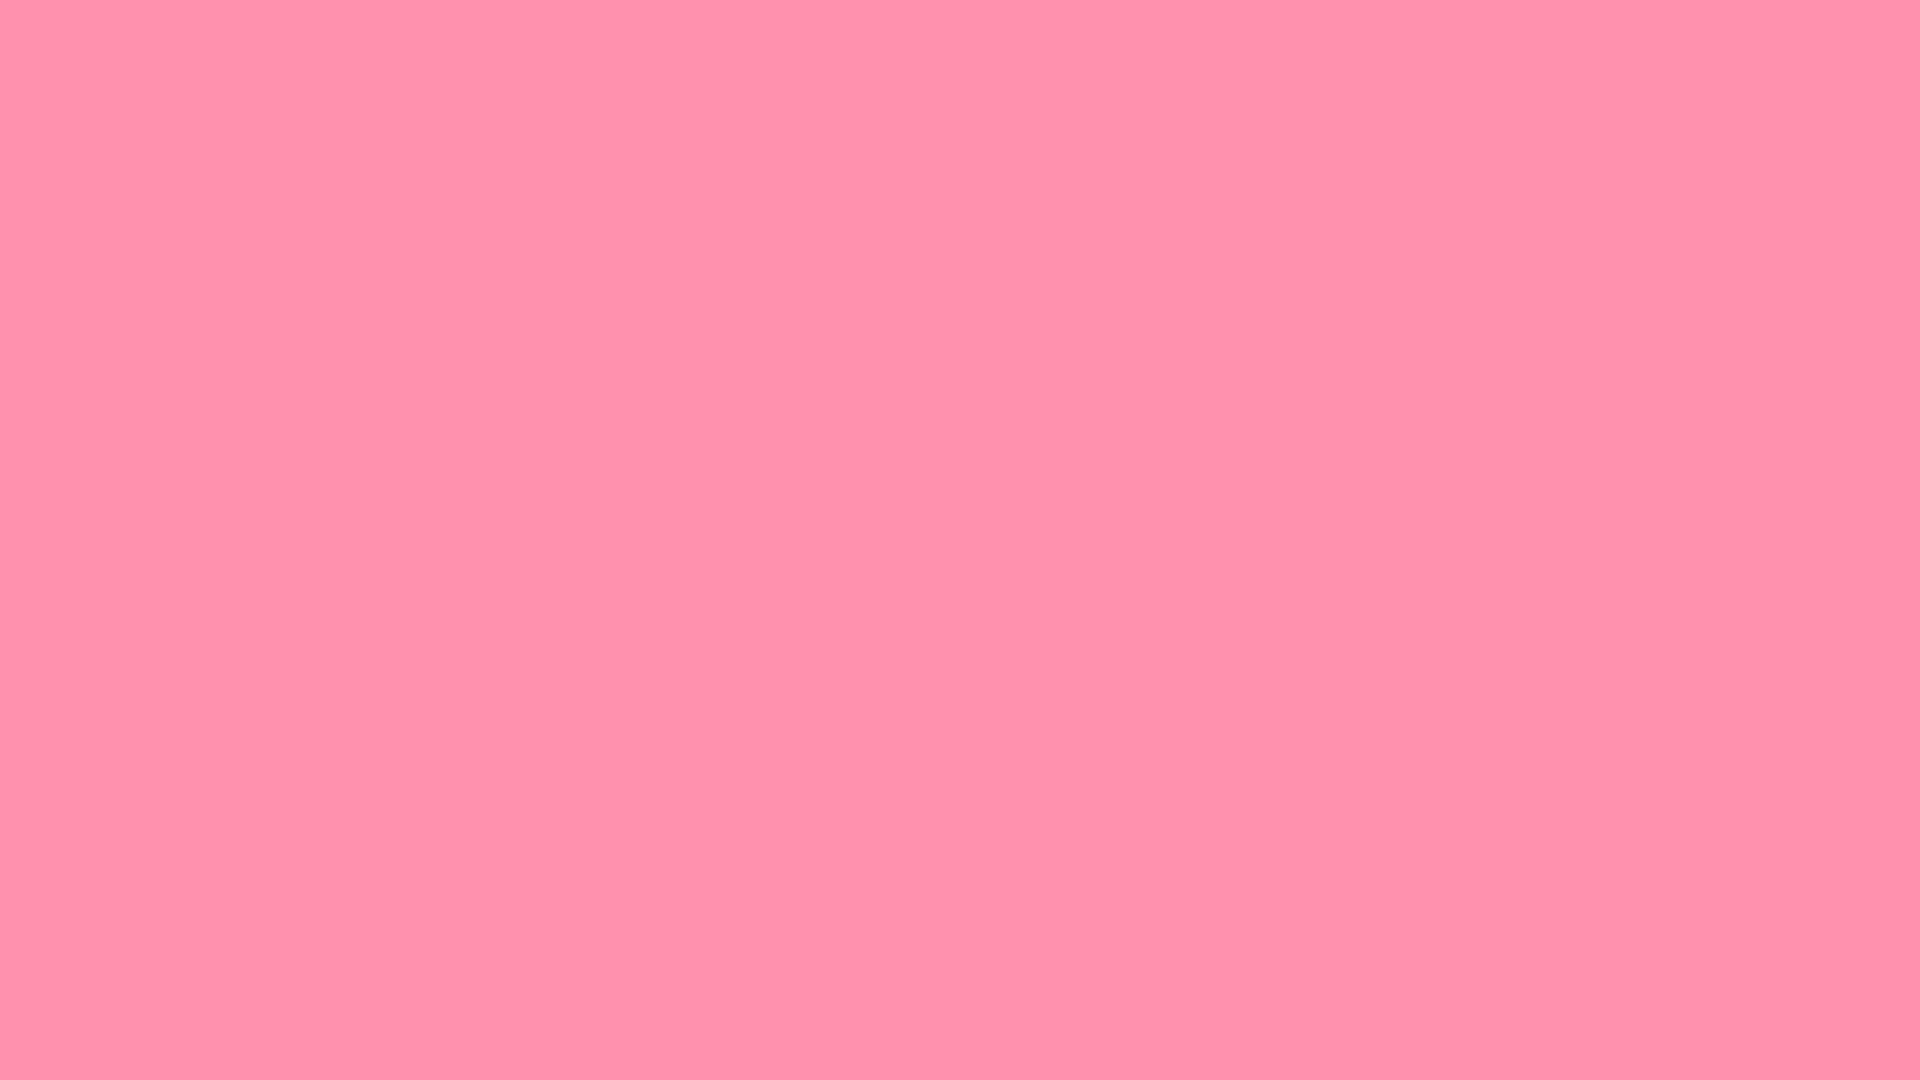 Cute Wallpapers In Pink Colour Baker Miller Pink Wallpaper High Definition High